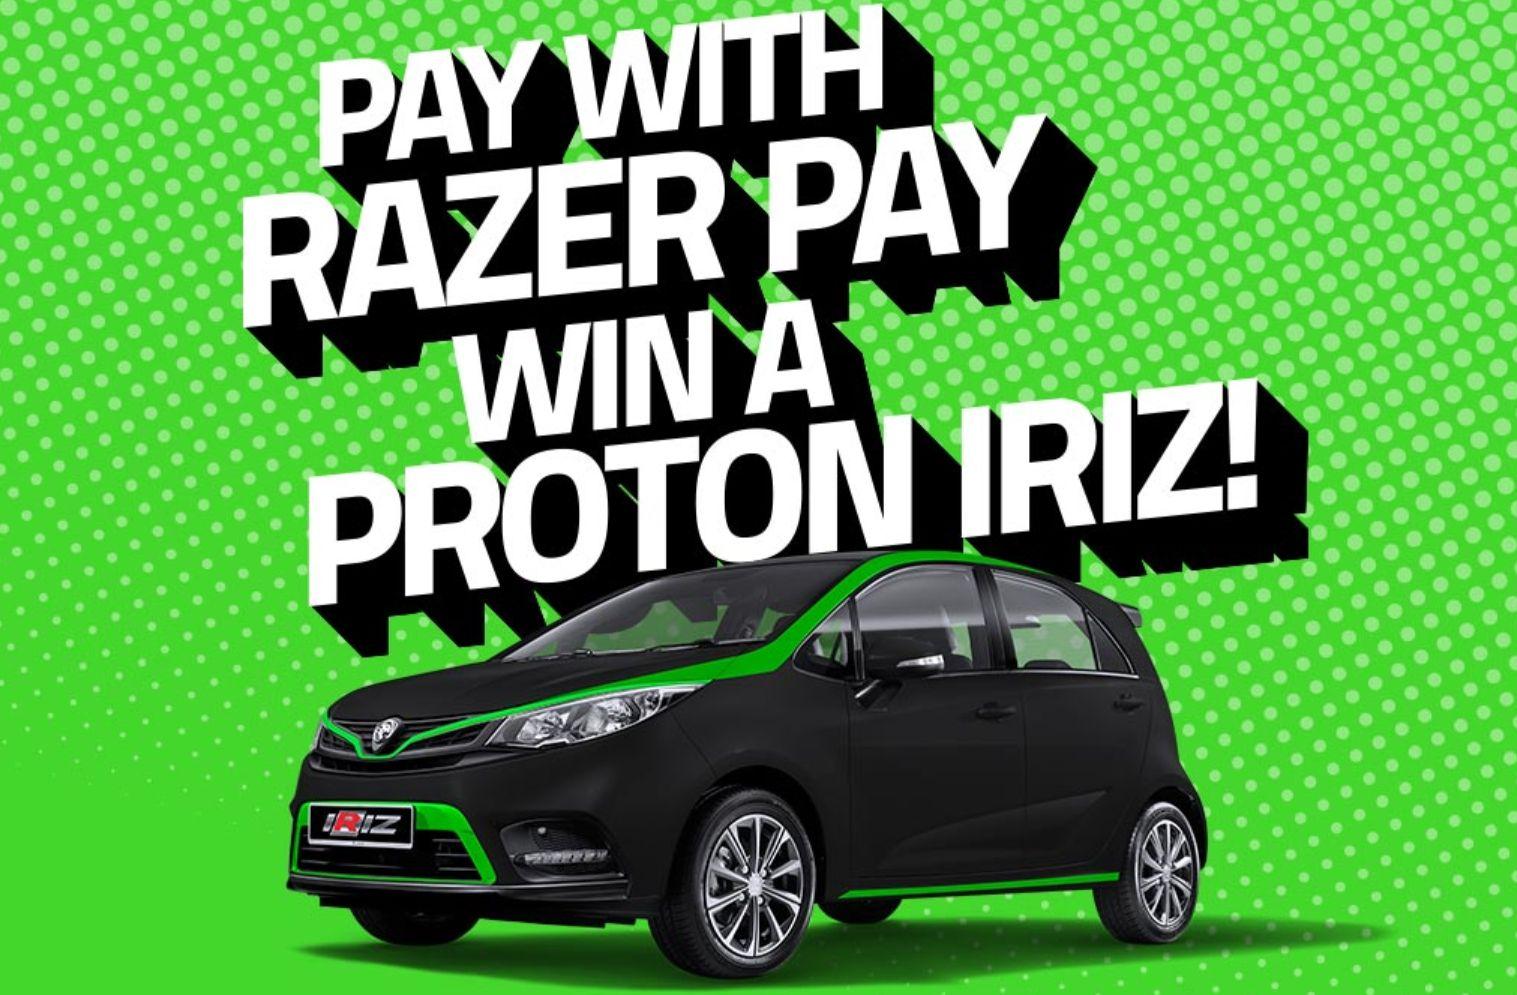 Razer teamed up with Proton to create a one-of-a-kind Razer